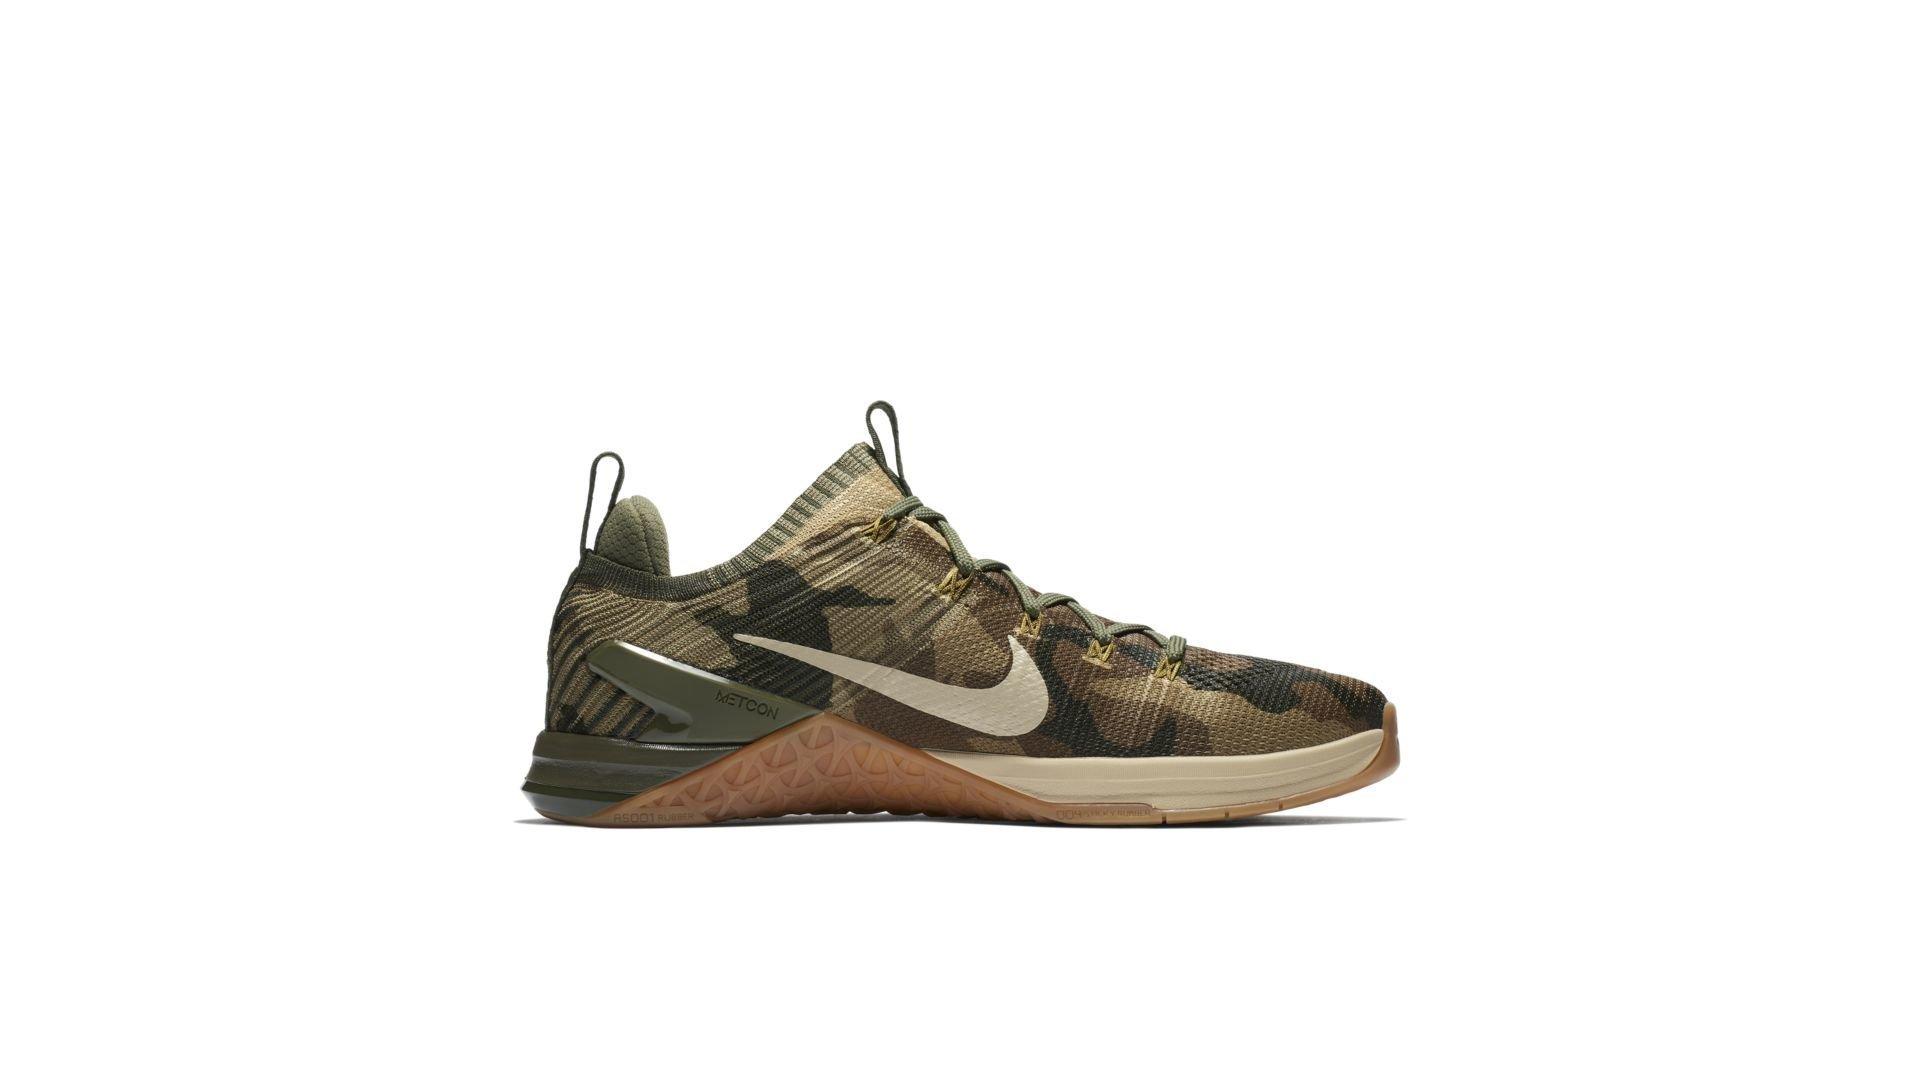 Nike Metcon DSX Flyknit 2 Army Camo (924423-300)